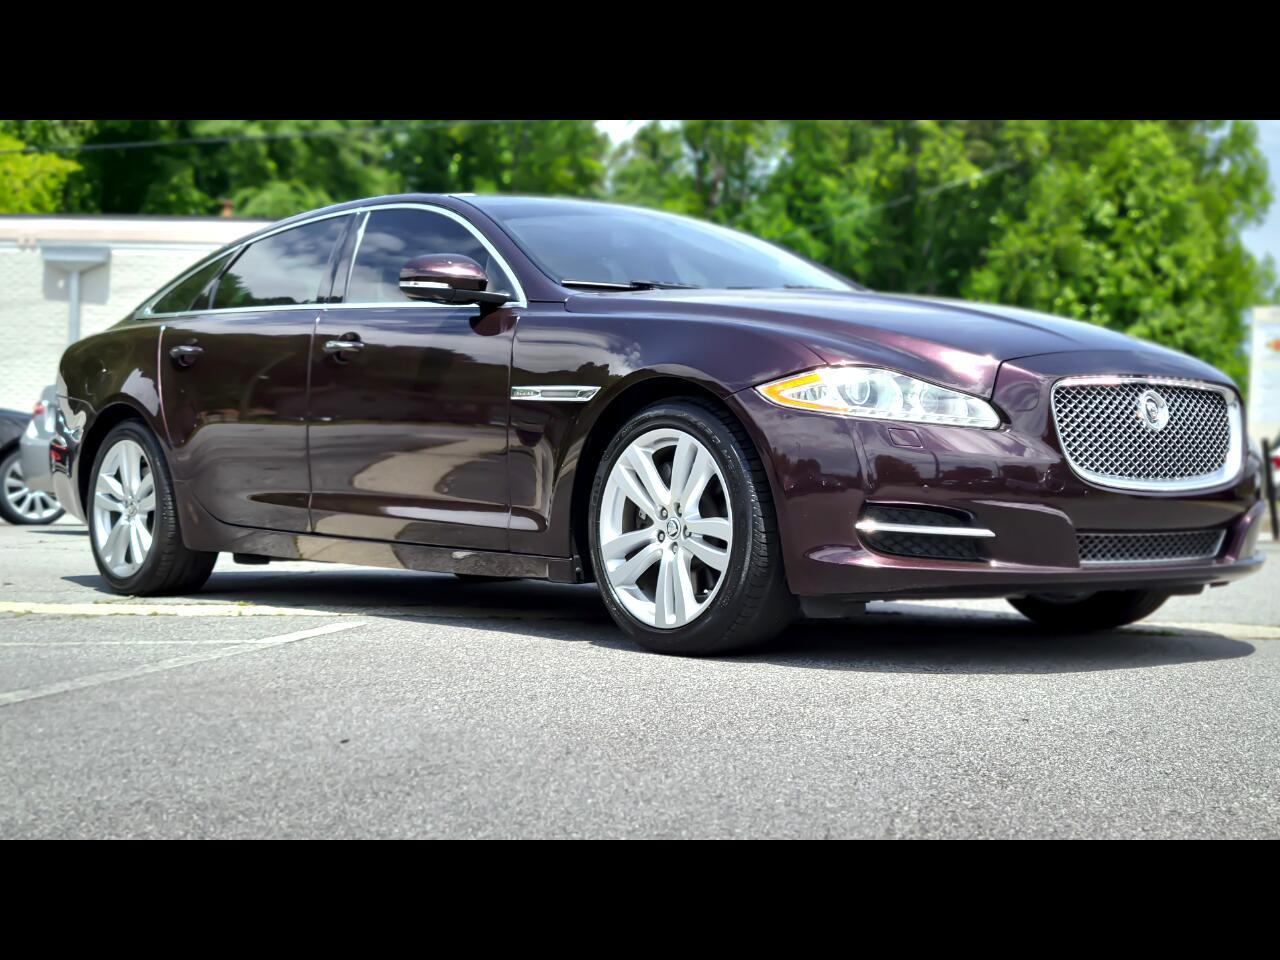 Jaguar XJ-Series XJL Supercharged 2011